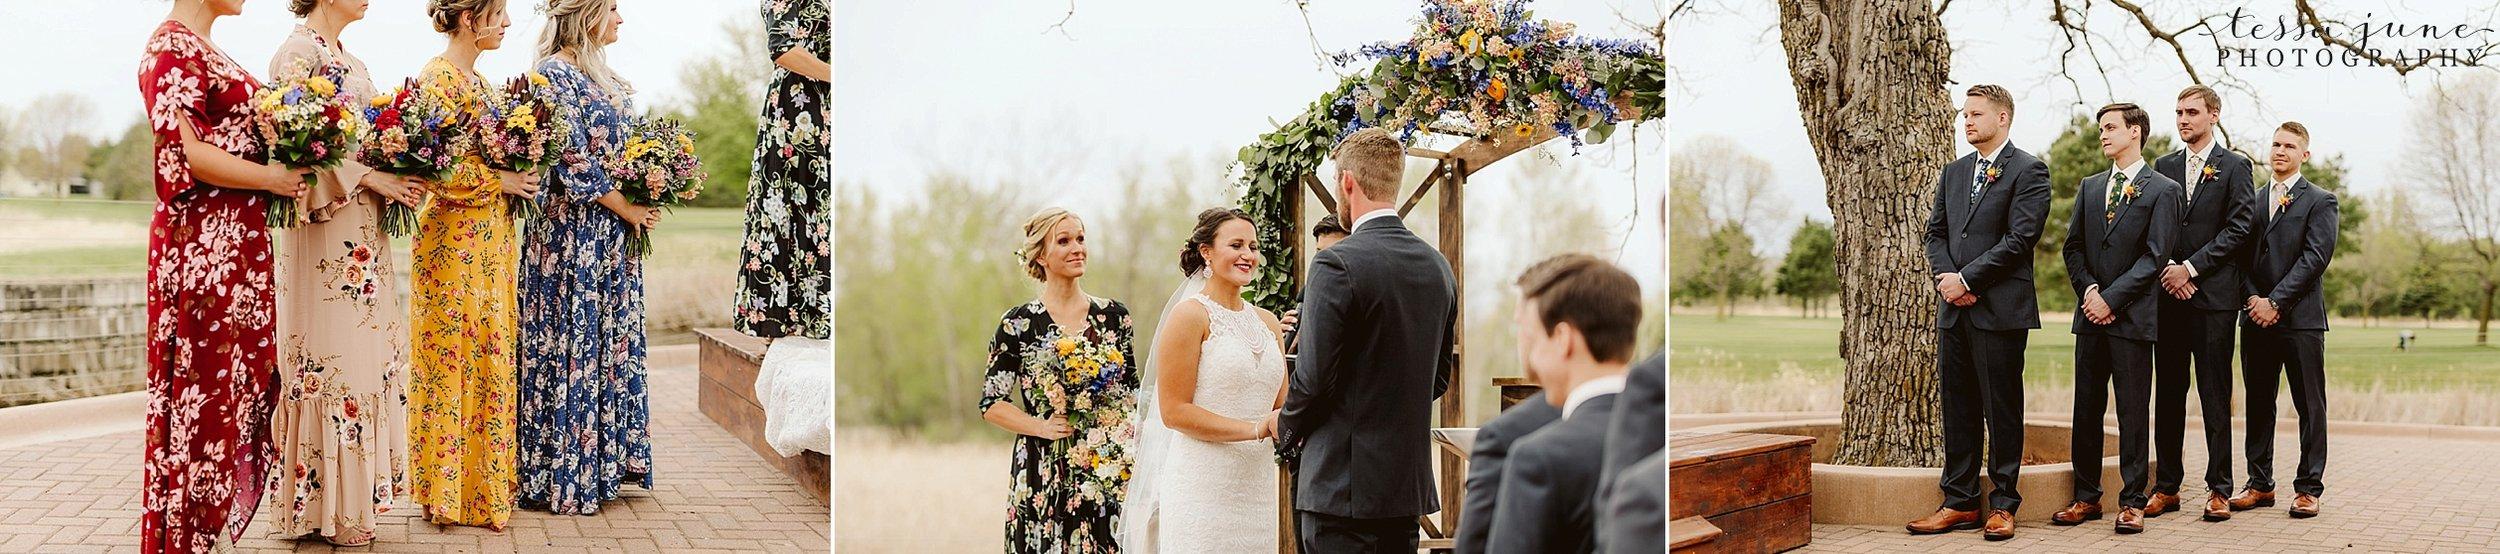 The-grands-at-mulligans-wedding-sartell-minnesota-spring-floral-spring-garden-wedding-93.jpg